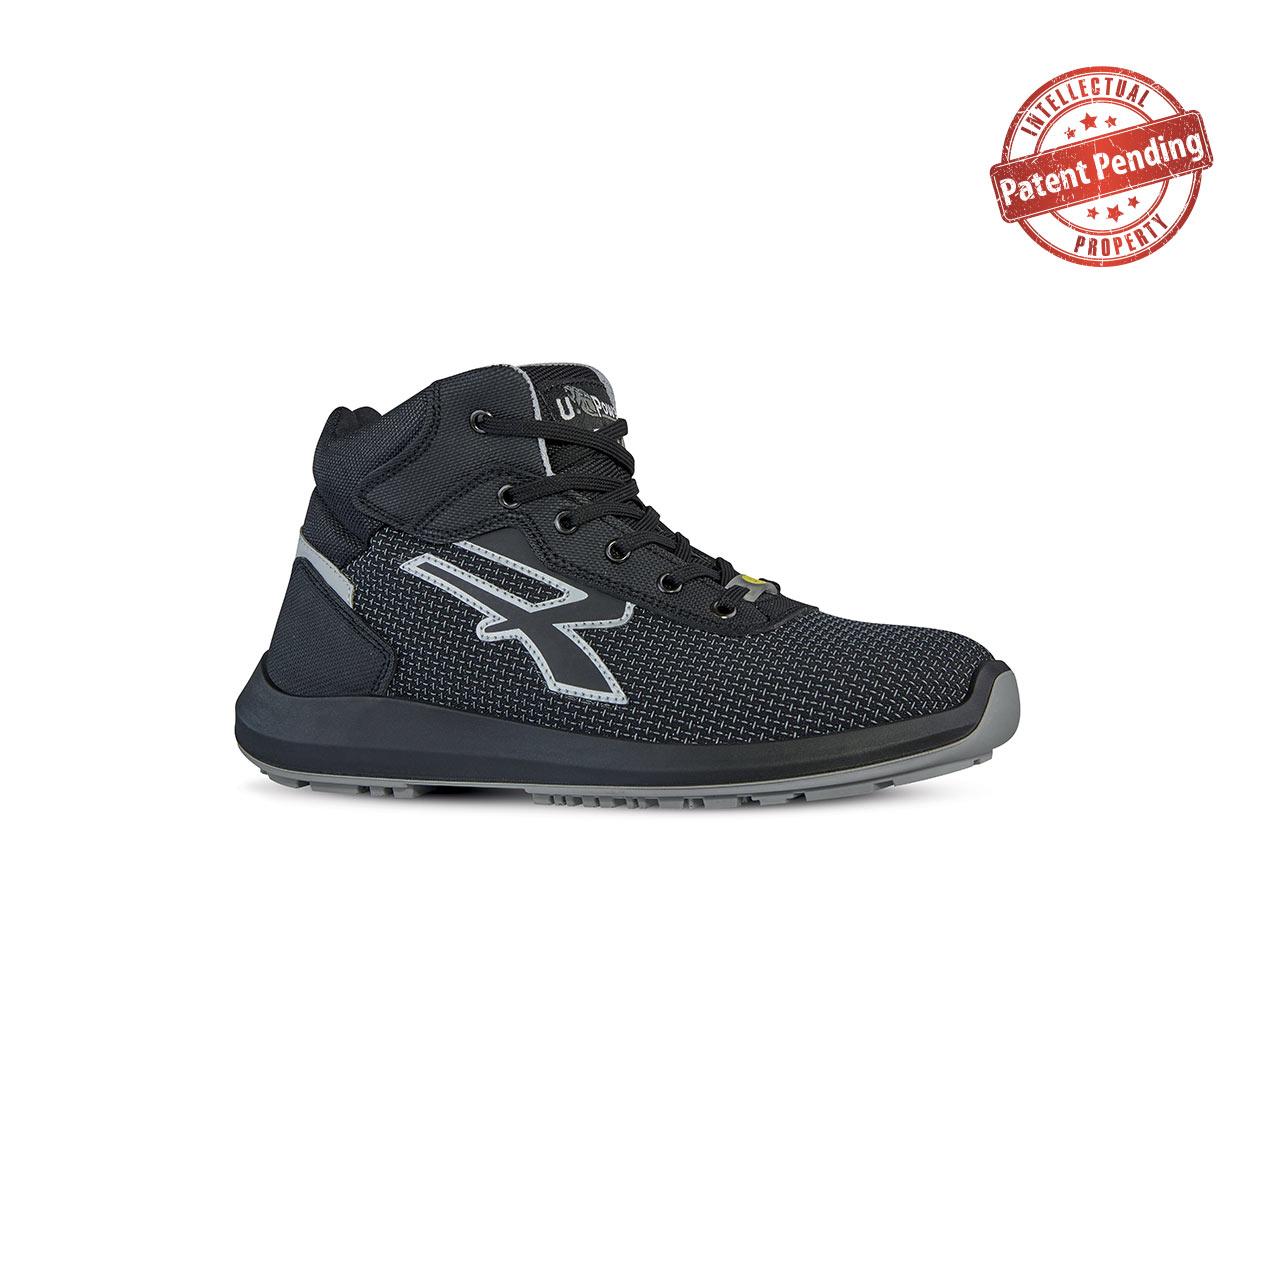 scarpa antinfortunistica alta upower modello captain linea redup vista laterale